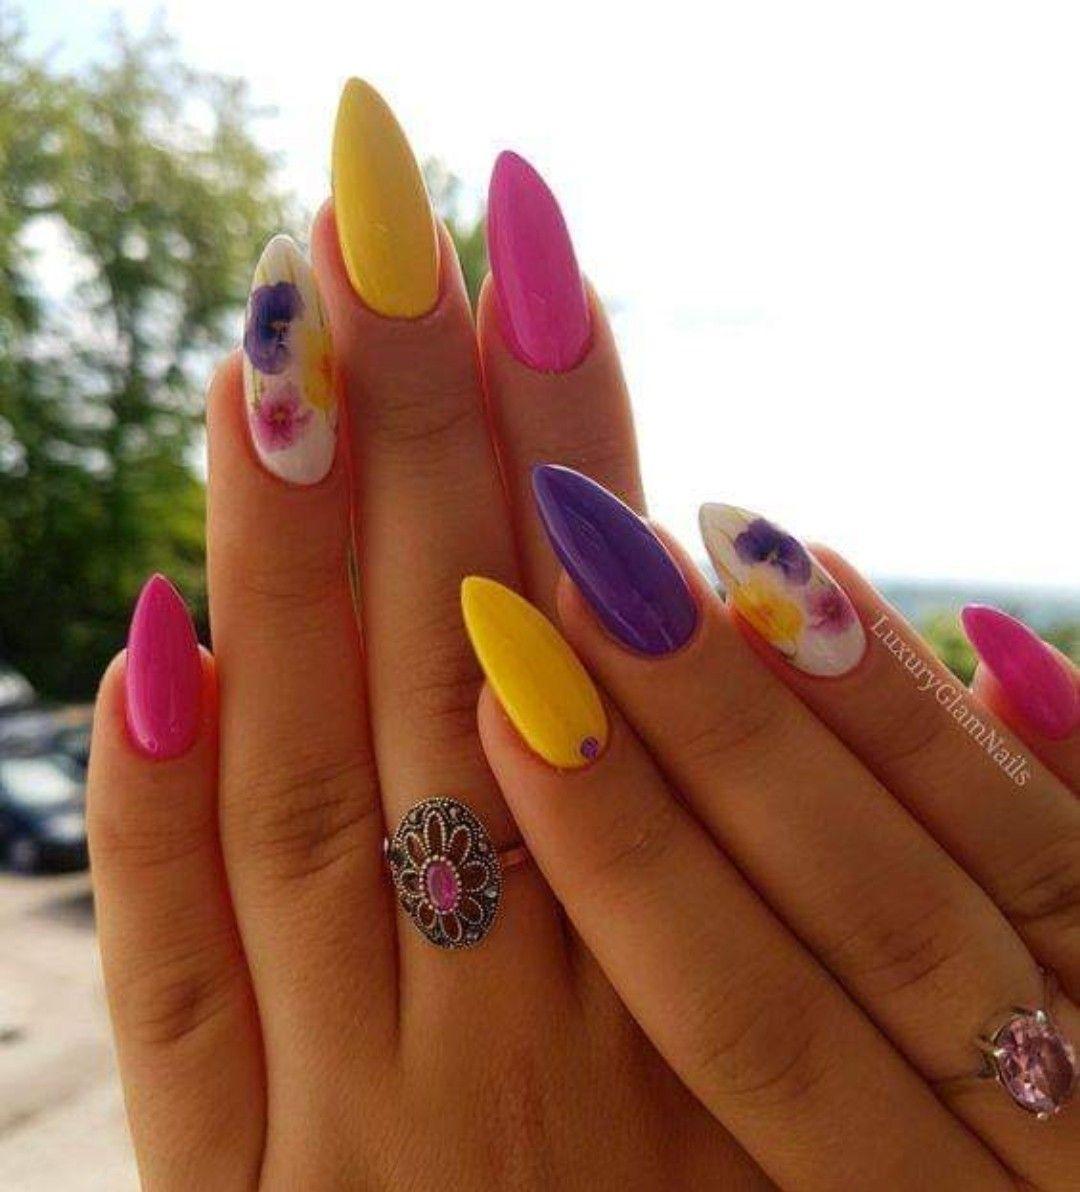 Pin By Iris Prokesova On Used Nail Ideas Trendy Nail Art Nail Designs Cute Acrylic Nails